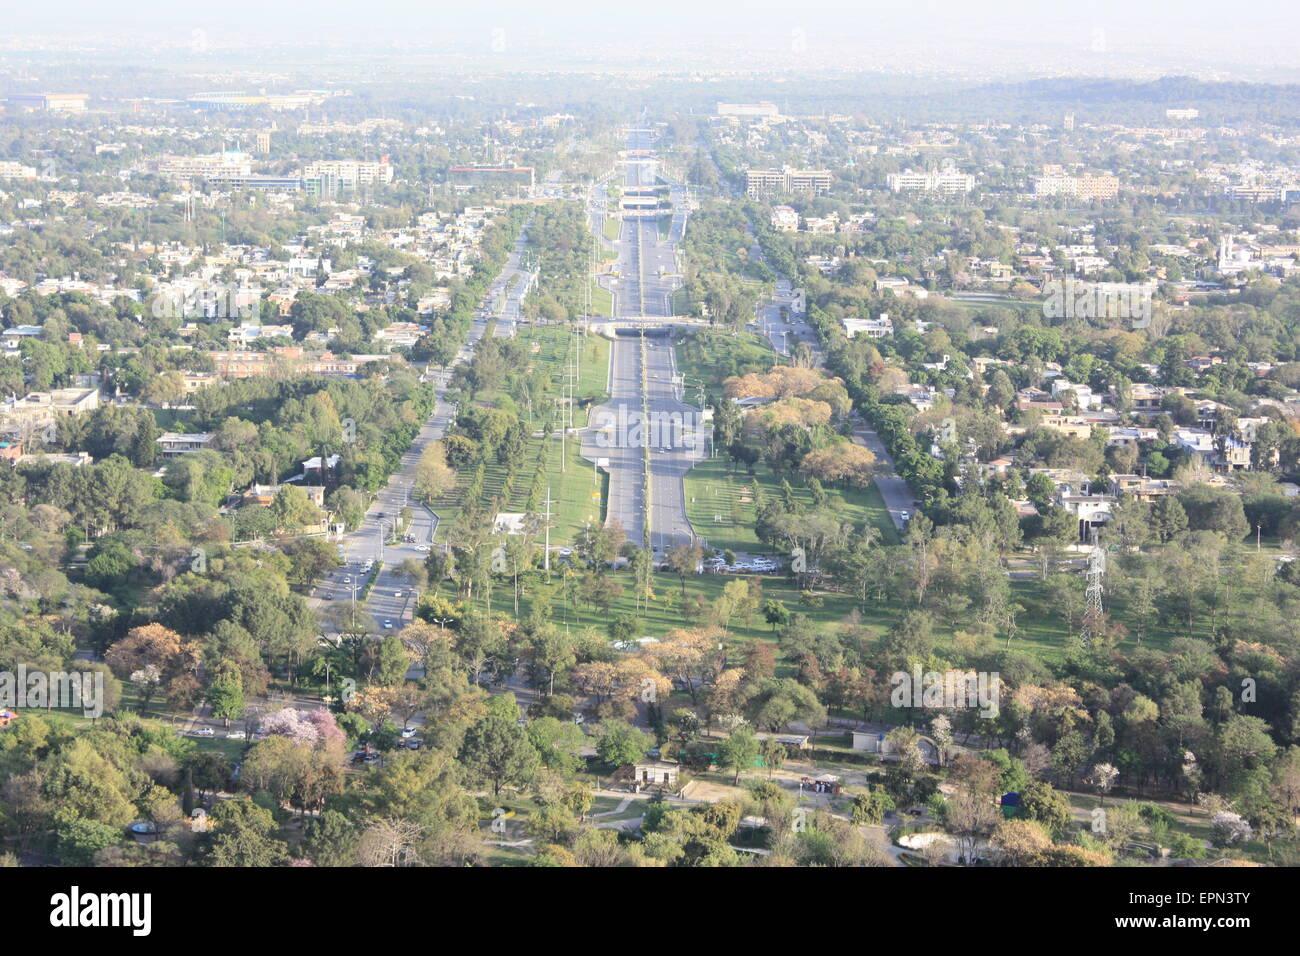 beautiful scenery city of Pakistan capital - Stock Image